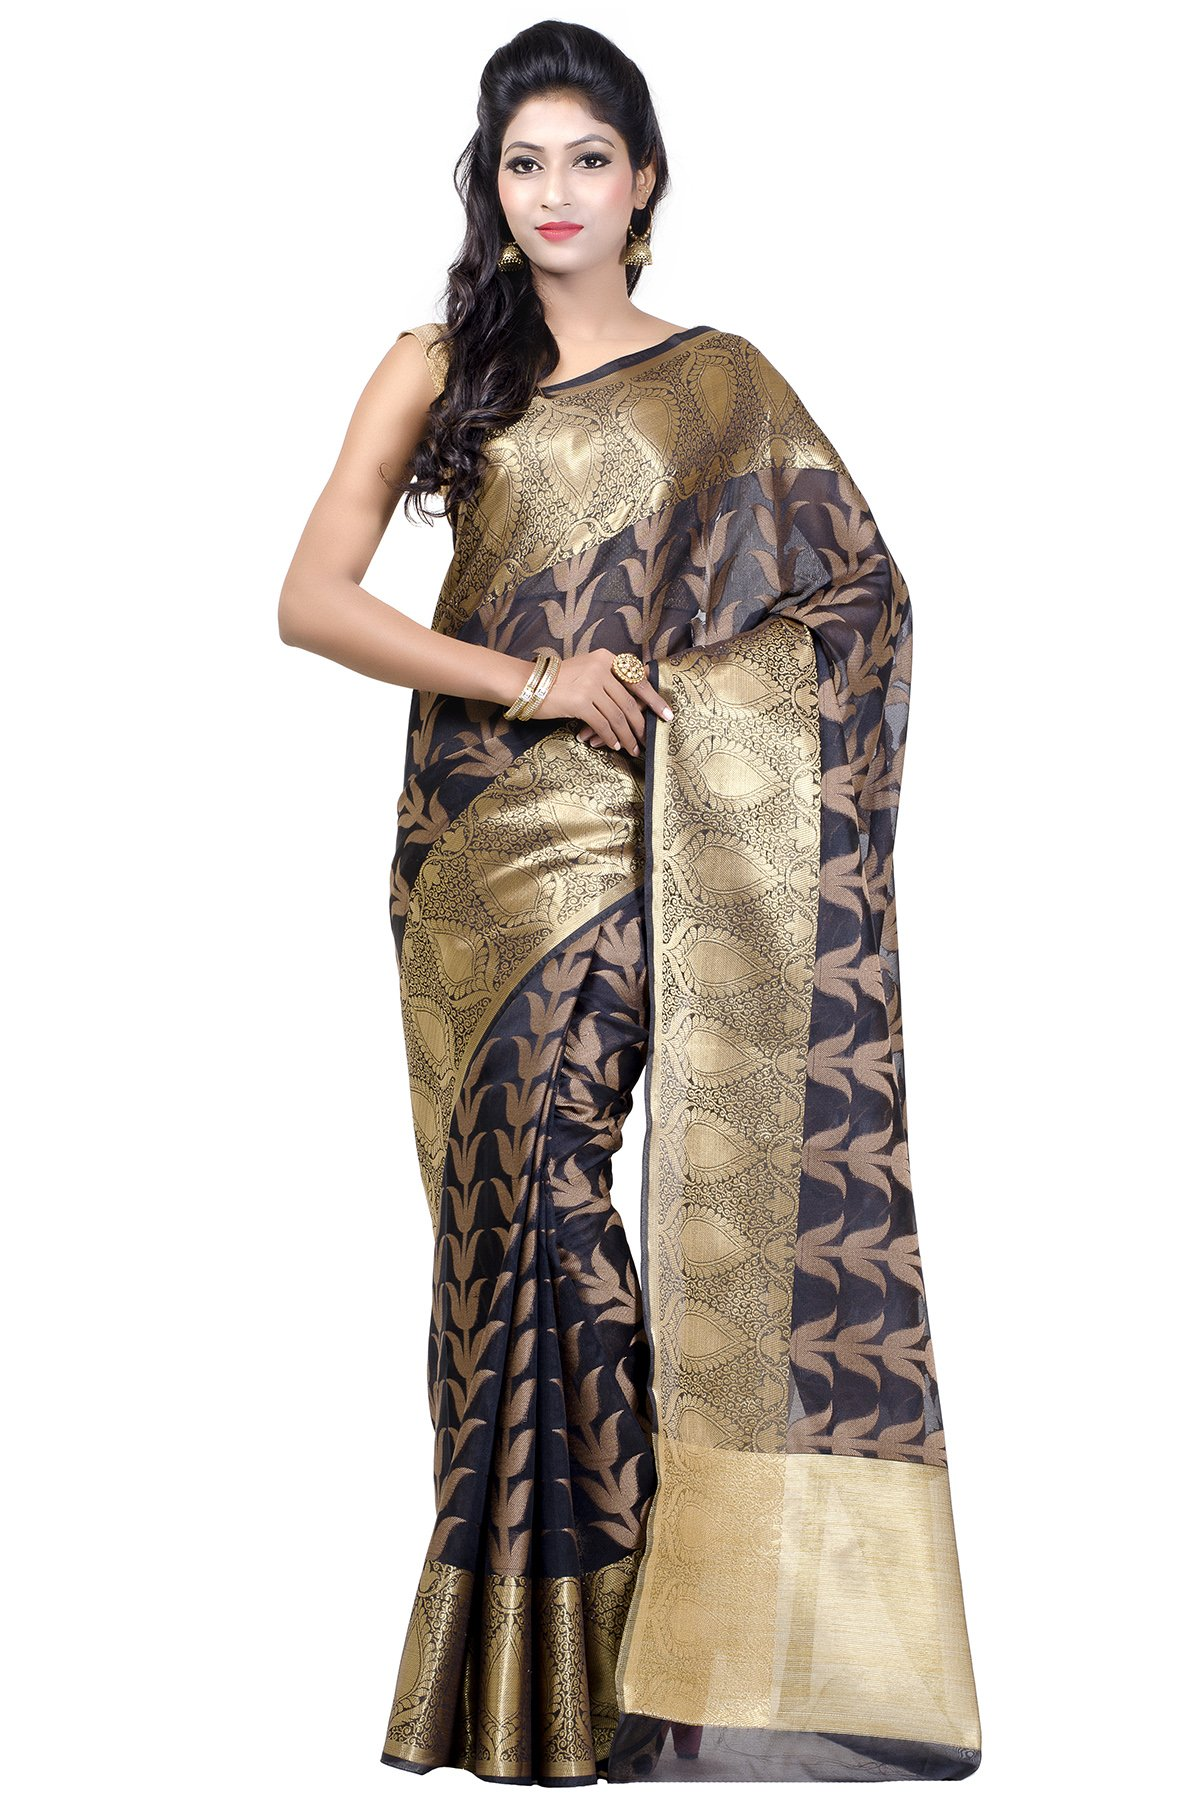 Chandrakala Women's Banarasi Cotton Silk Saree with Unstitched Blouse Piece